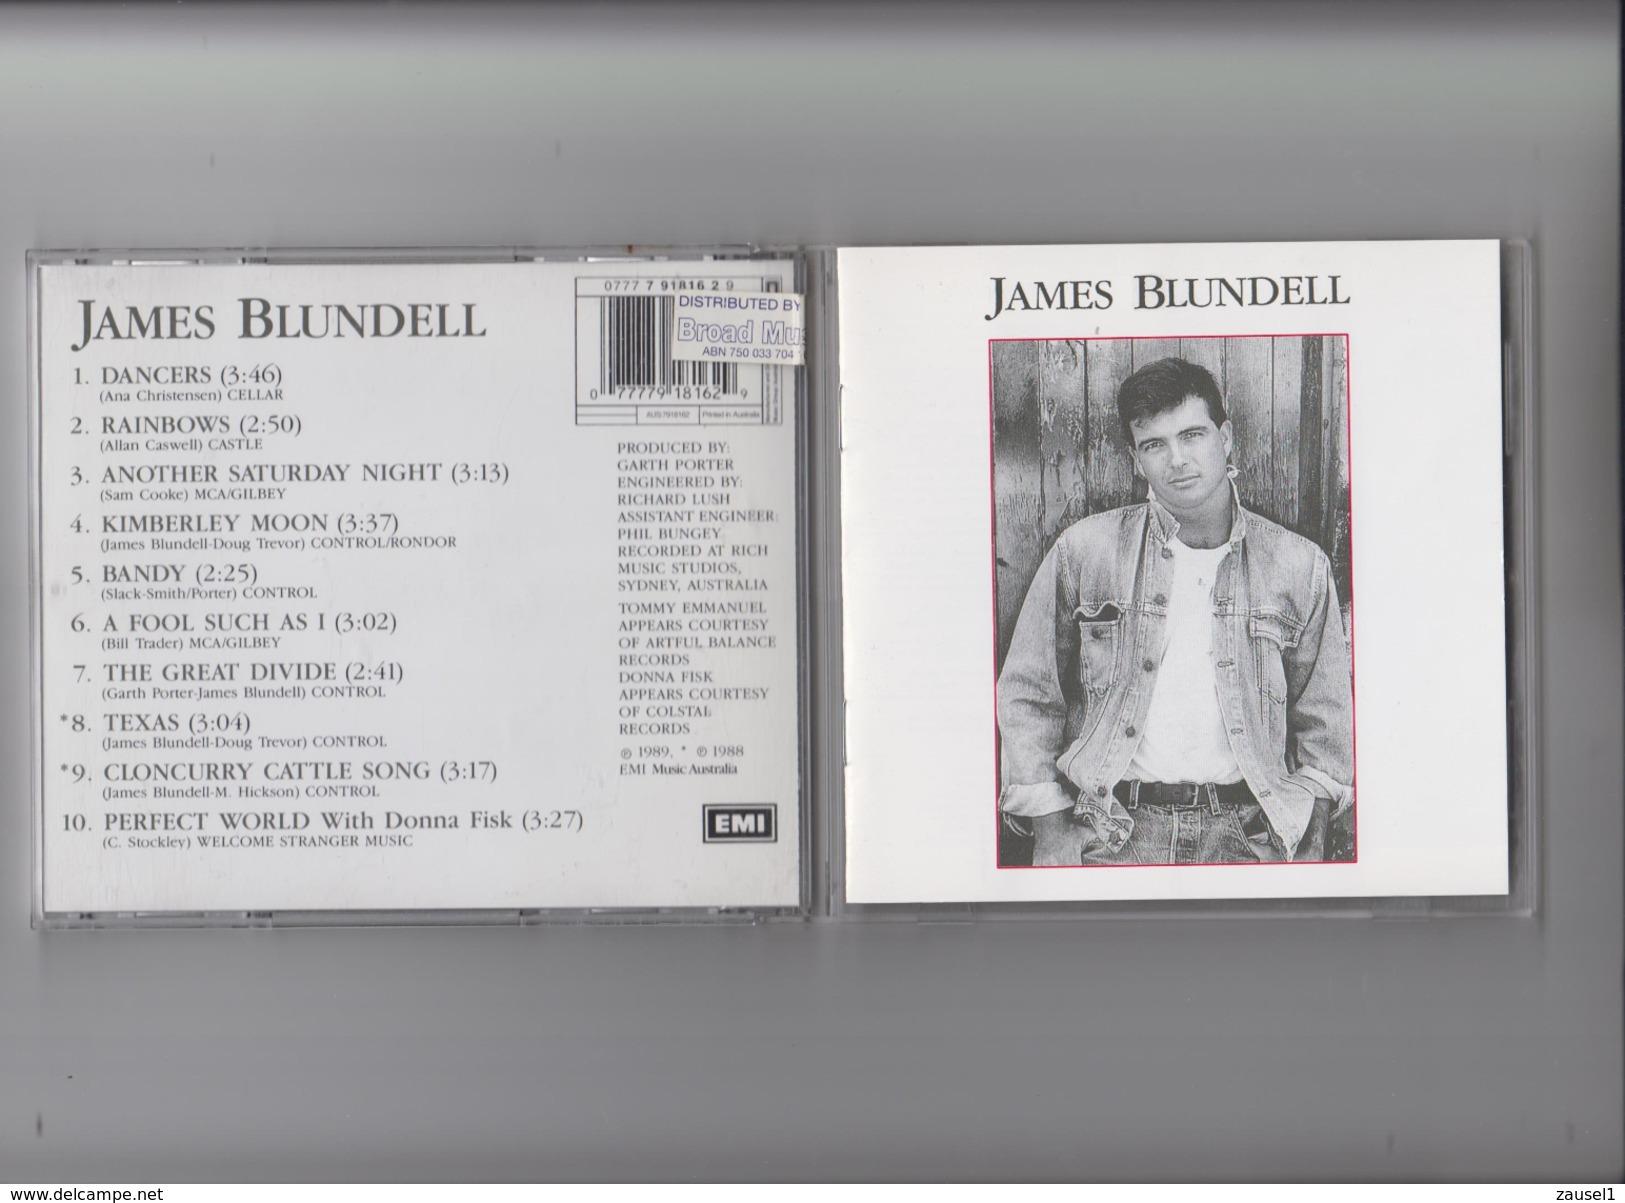 James Blundell - SAME - Original CD - Country & Folk